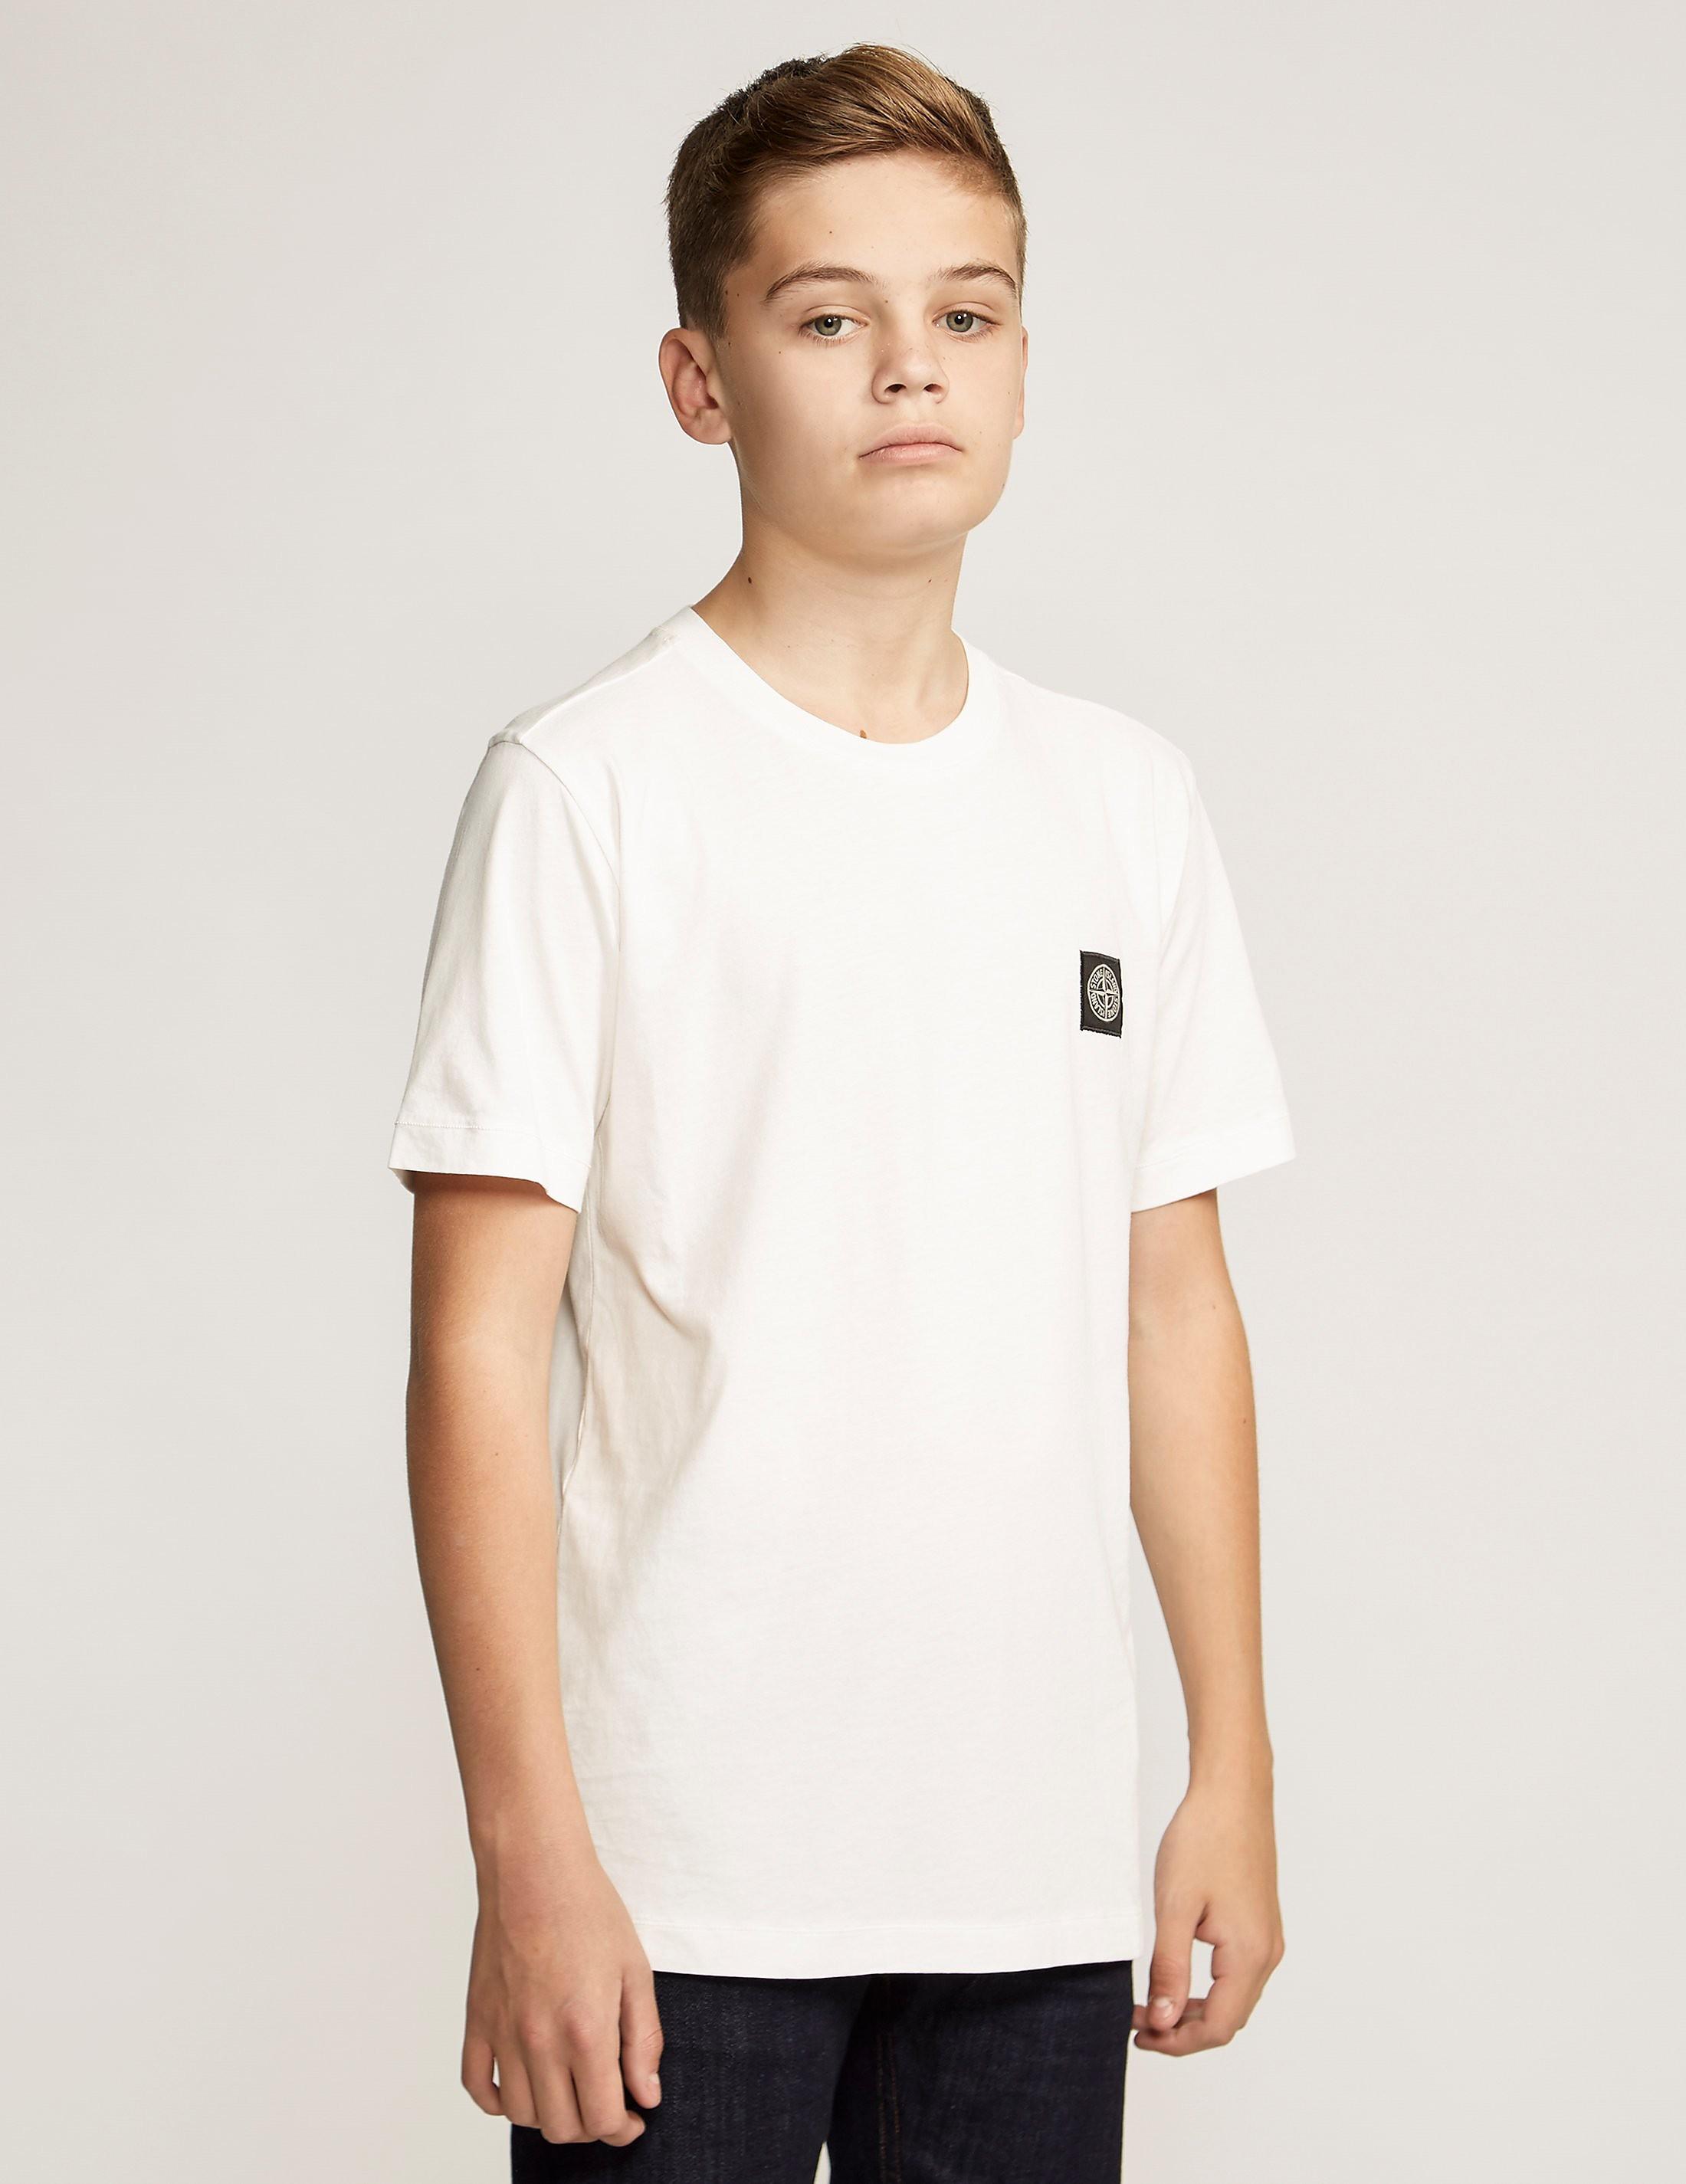 Stone Island Kids' T-Shirt